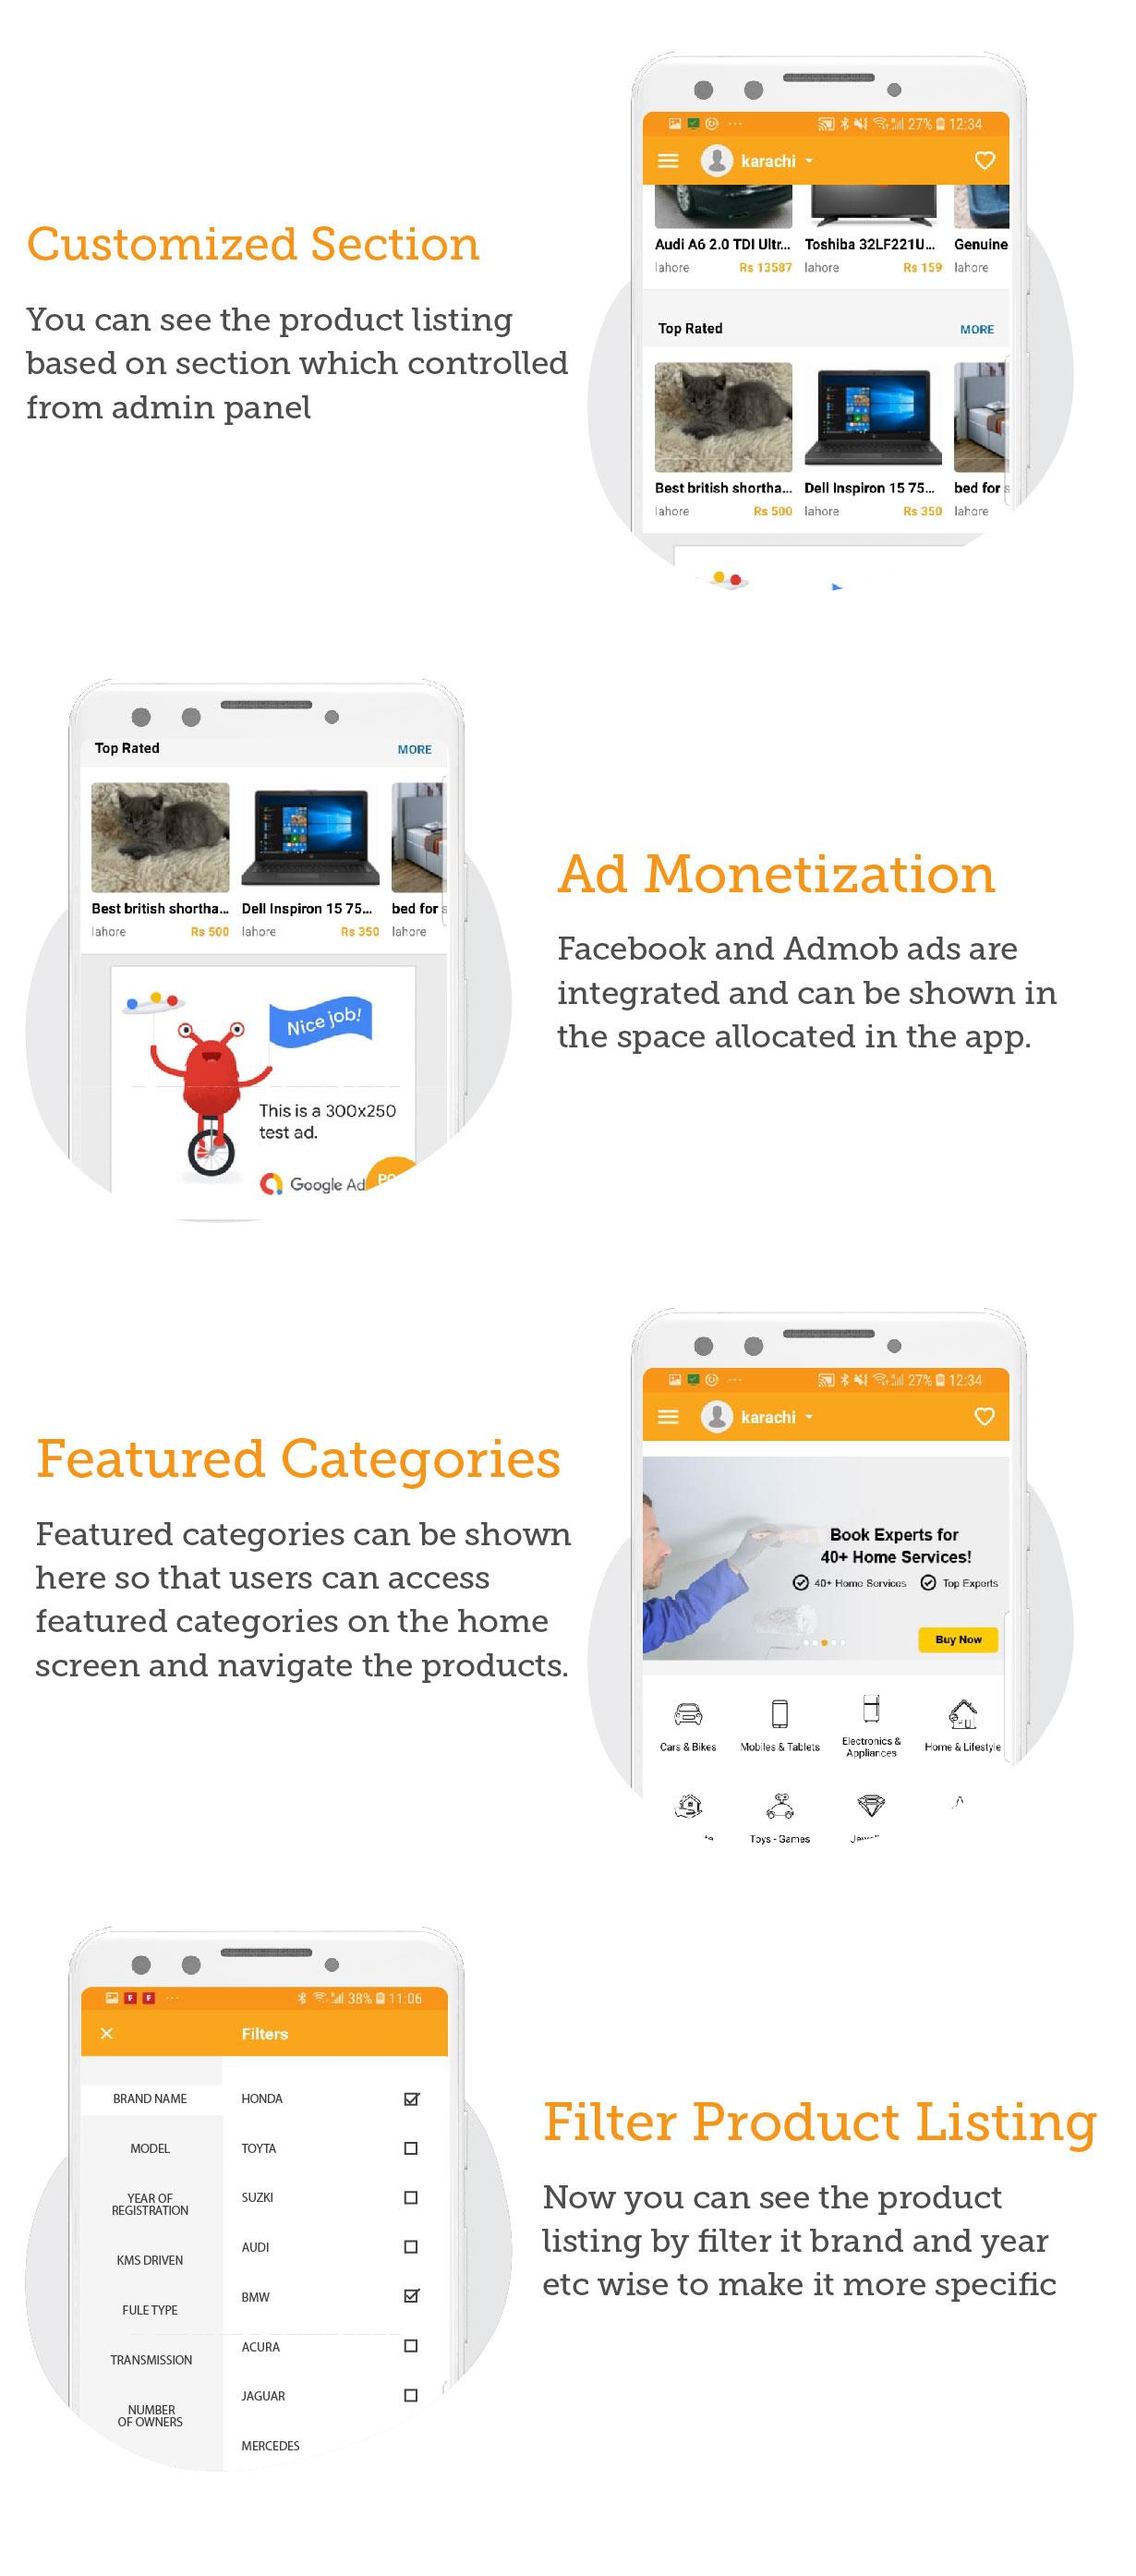 Advilla - Classified Android Native App v1.0.1 - 8